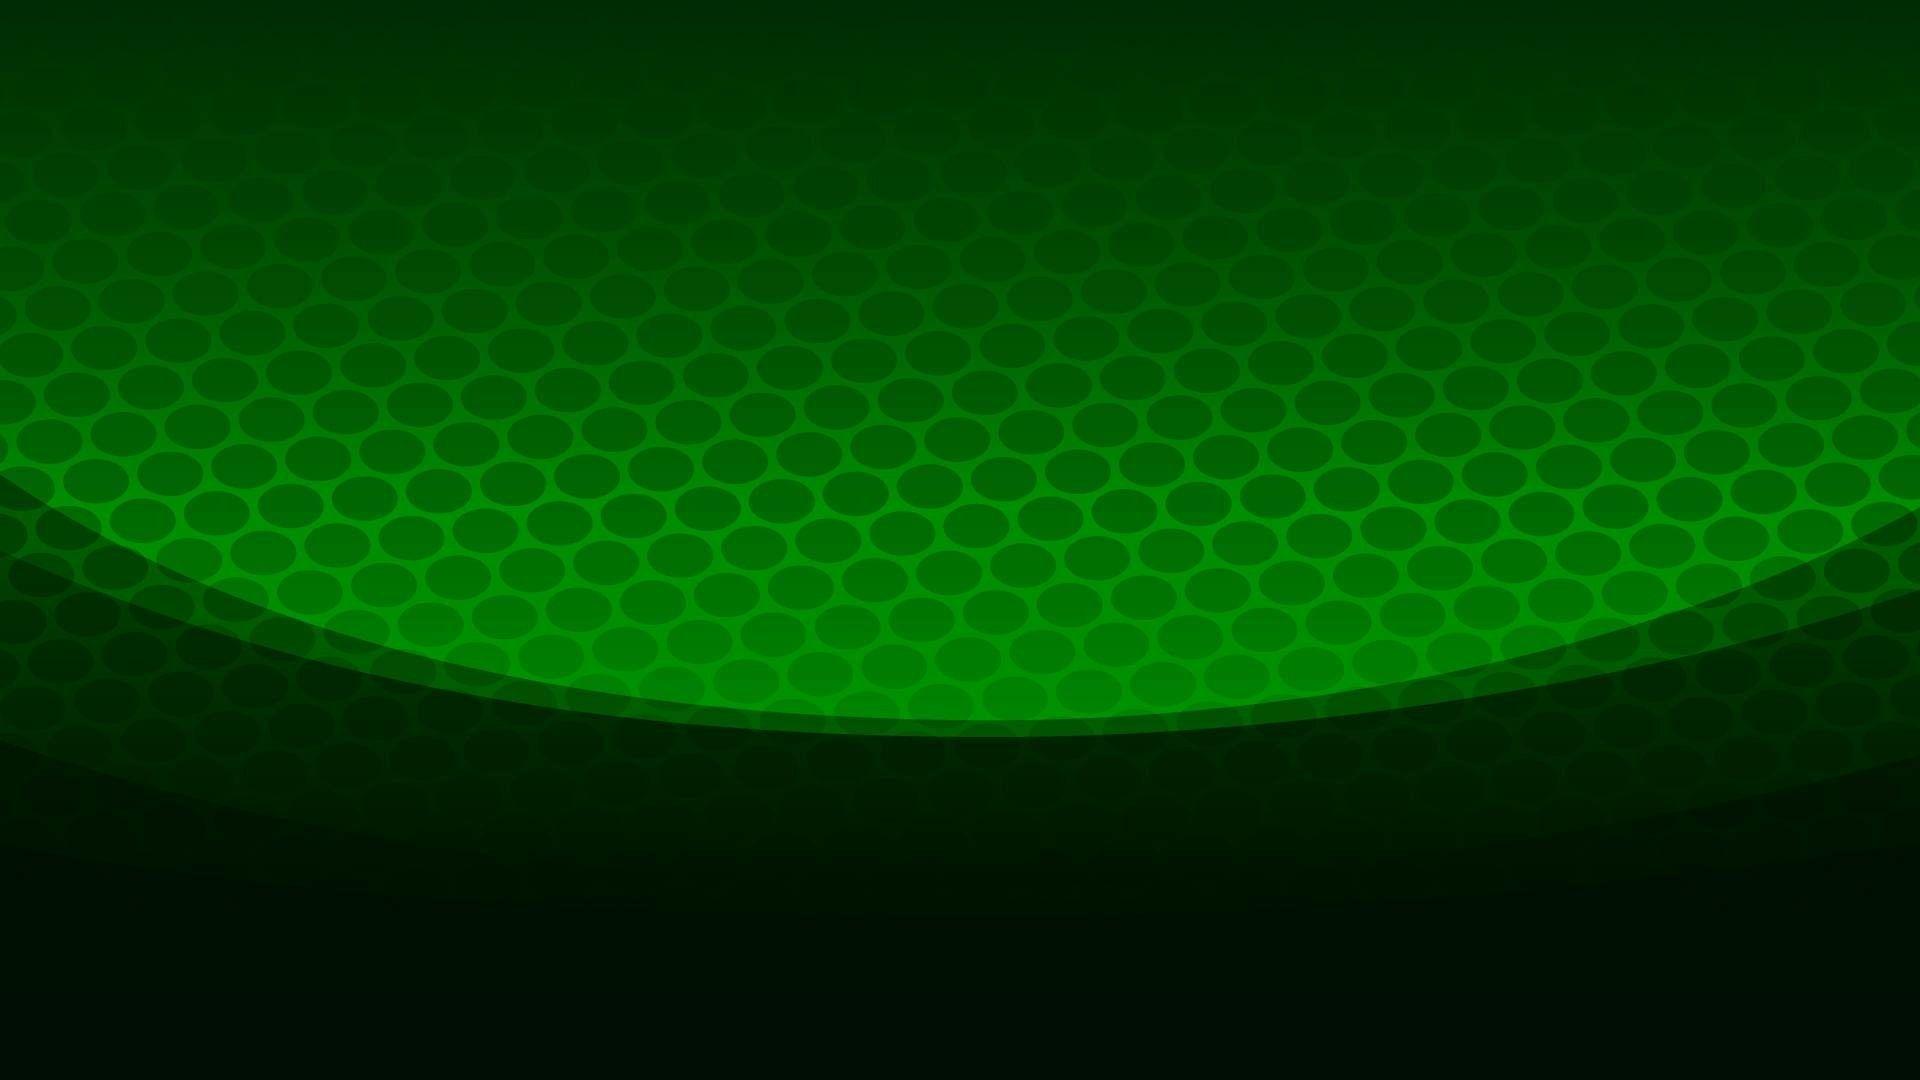 Neon Green PC Wallpaper HD